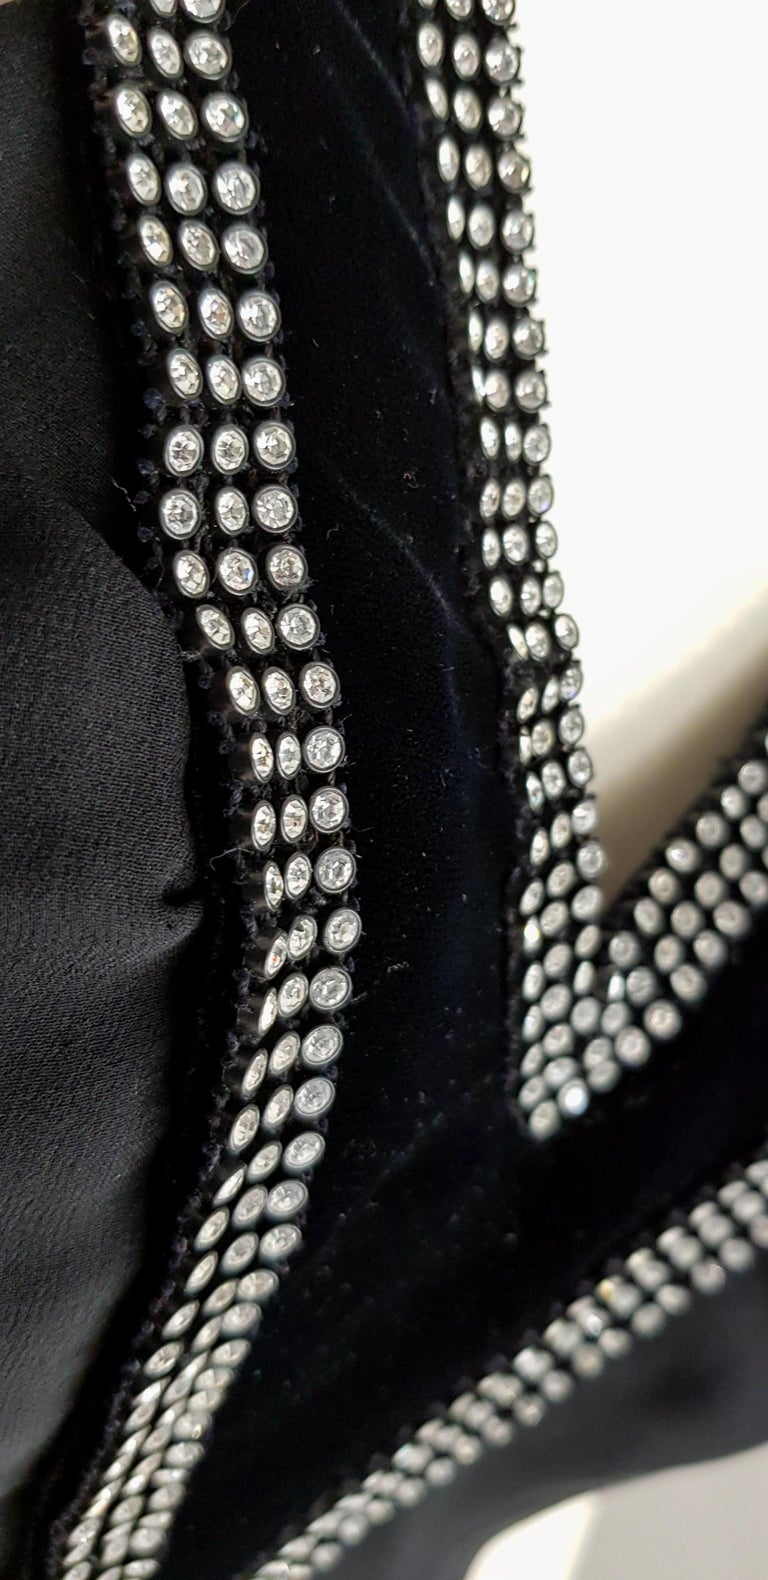 VALENTINO Haute Couture swarovski diamonds on black hems silk gown - Unworn, new For Sale 2